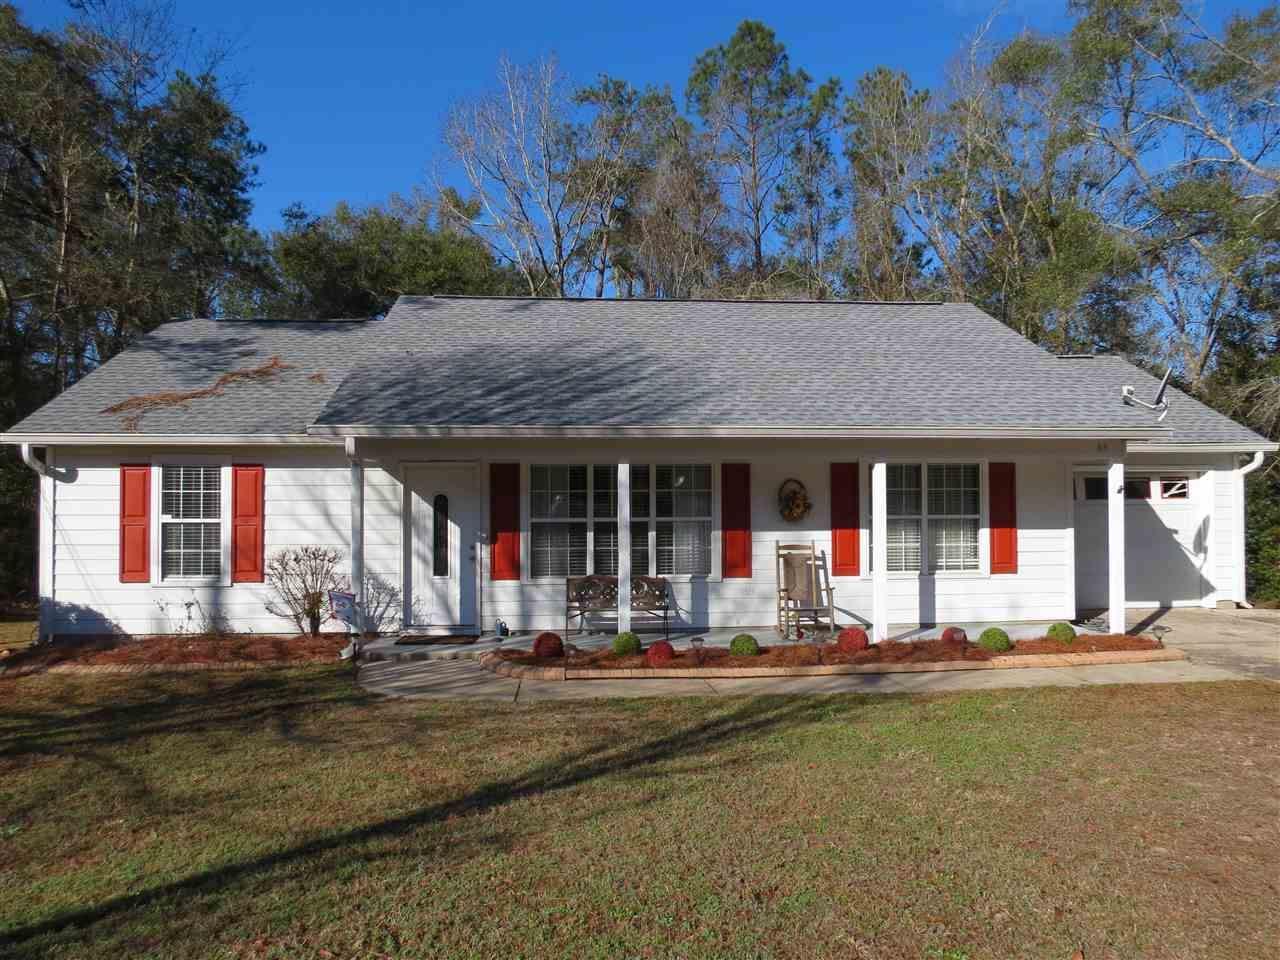 64 Shadow Oak Circle, Crawfordville, FL 32327 - MLS#: 329066